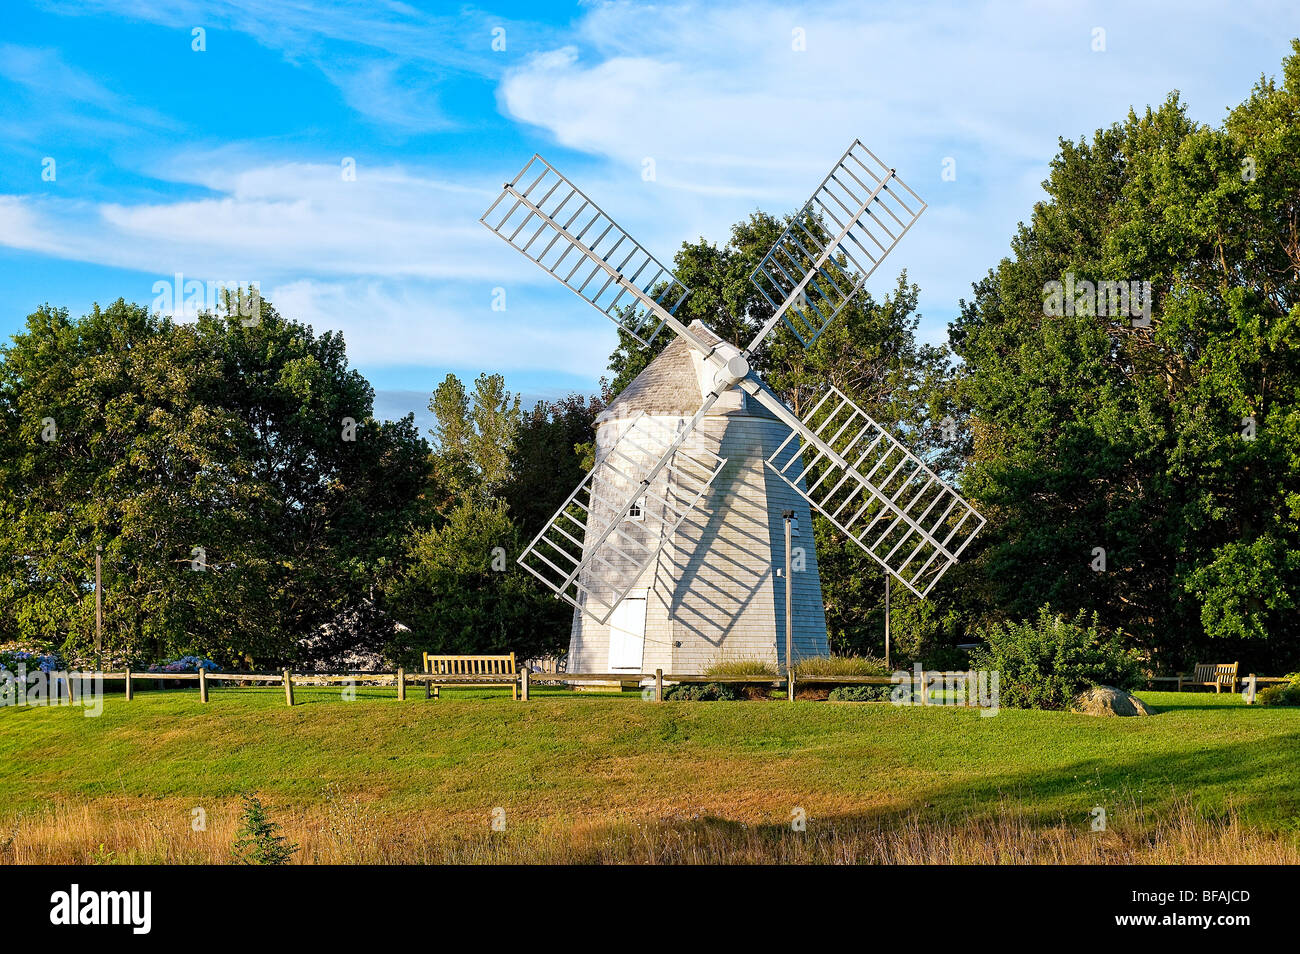 Jonathan Young Windmühle, Orleans, Cape Cod, Massachusetts, USA Stockbild